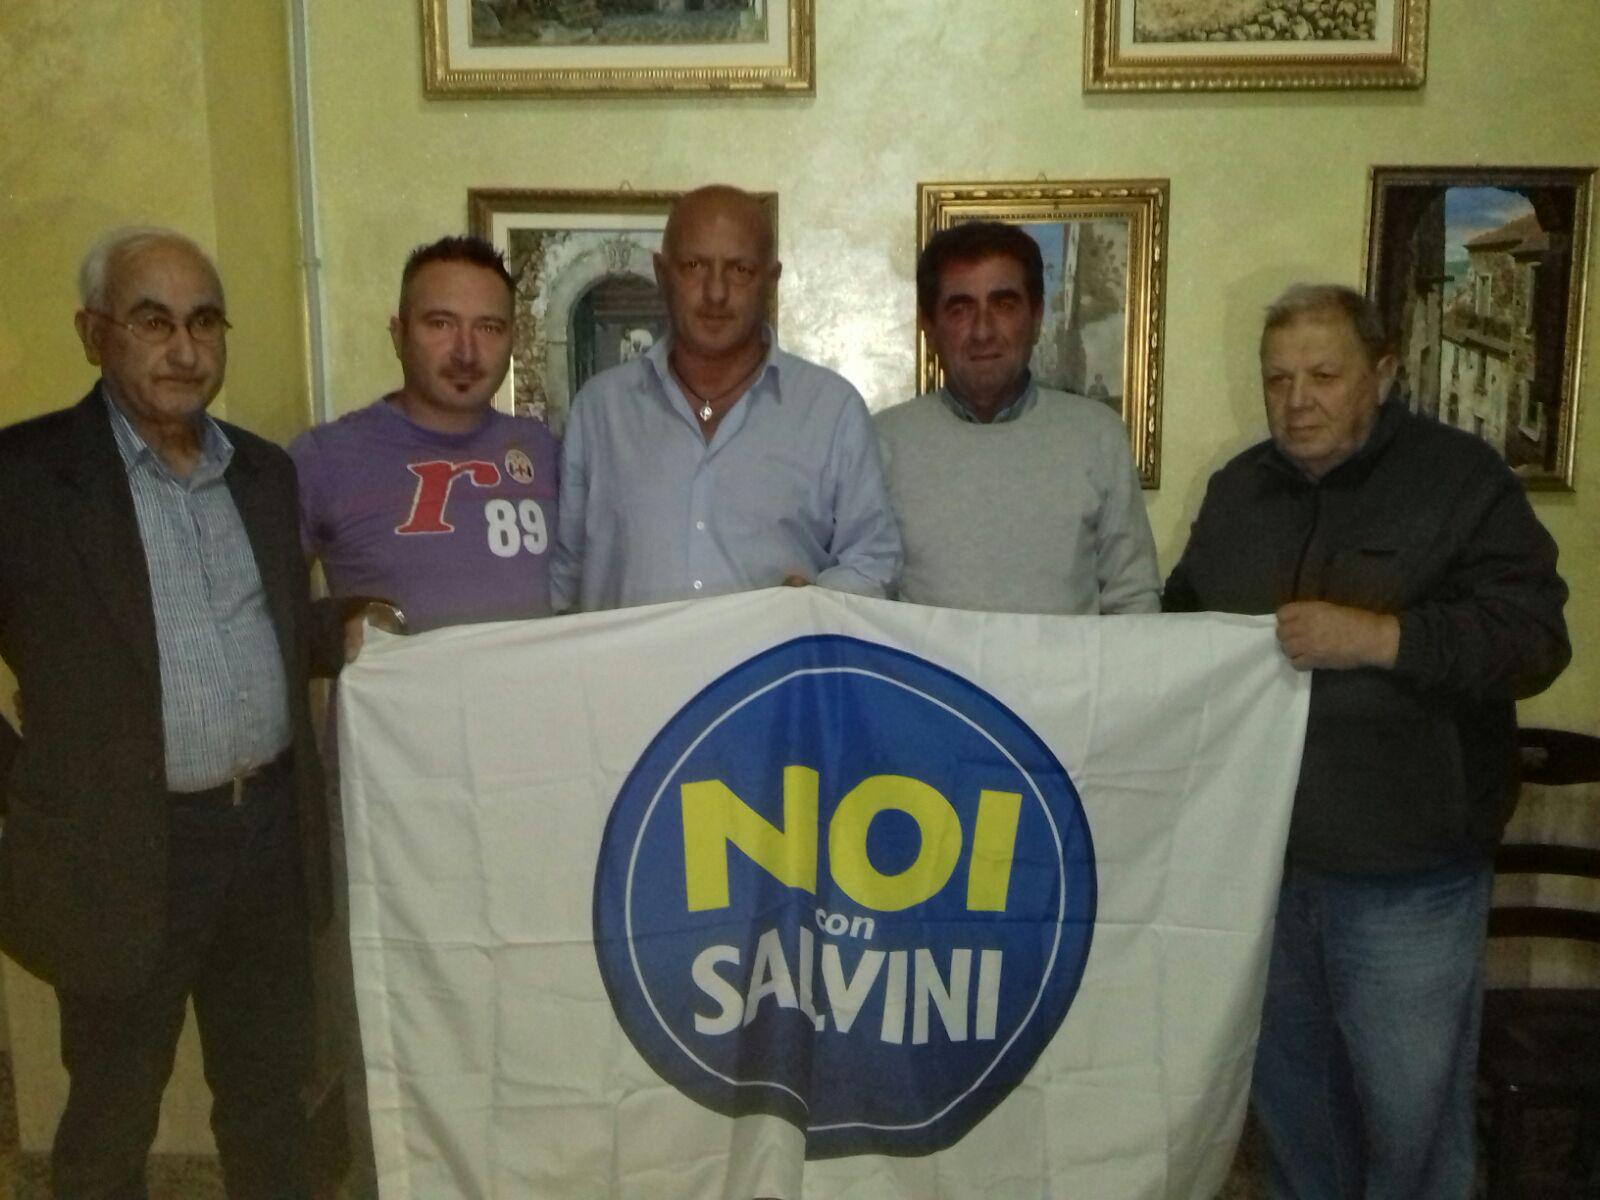 Noi con Salvini-Cicerale-